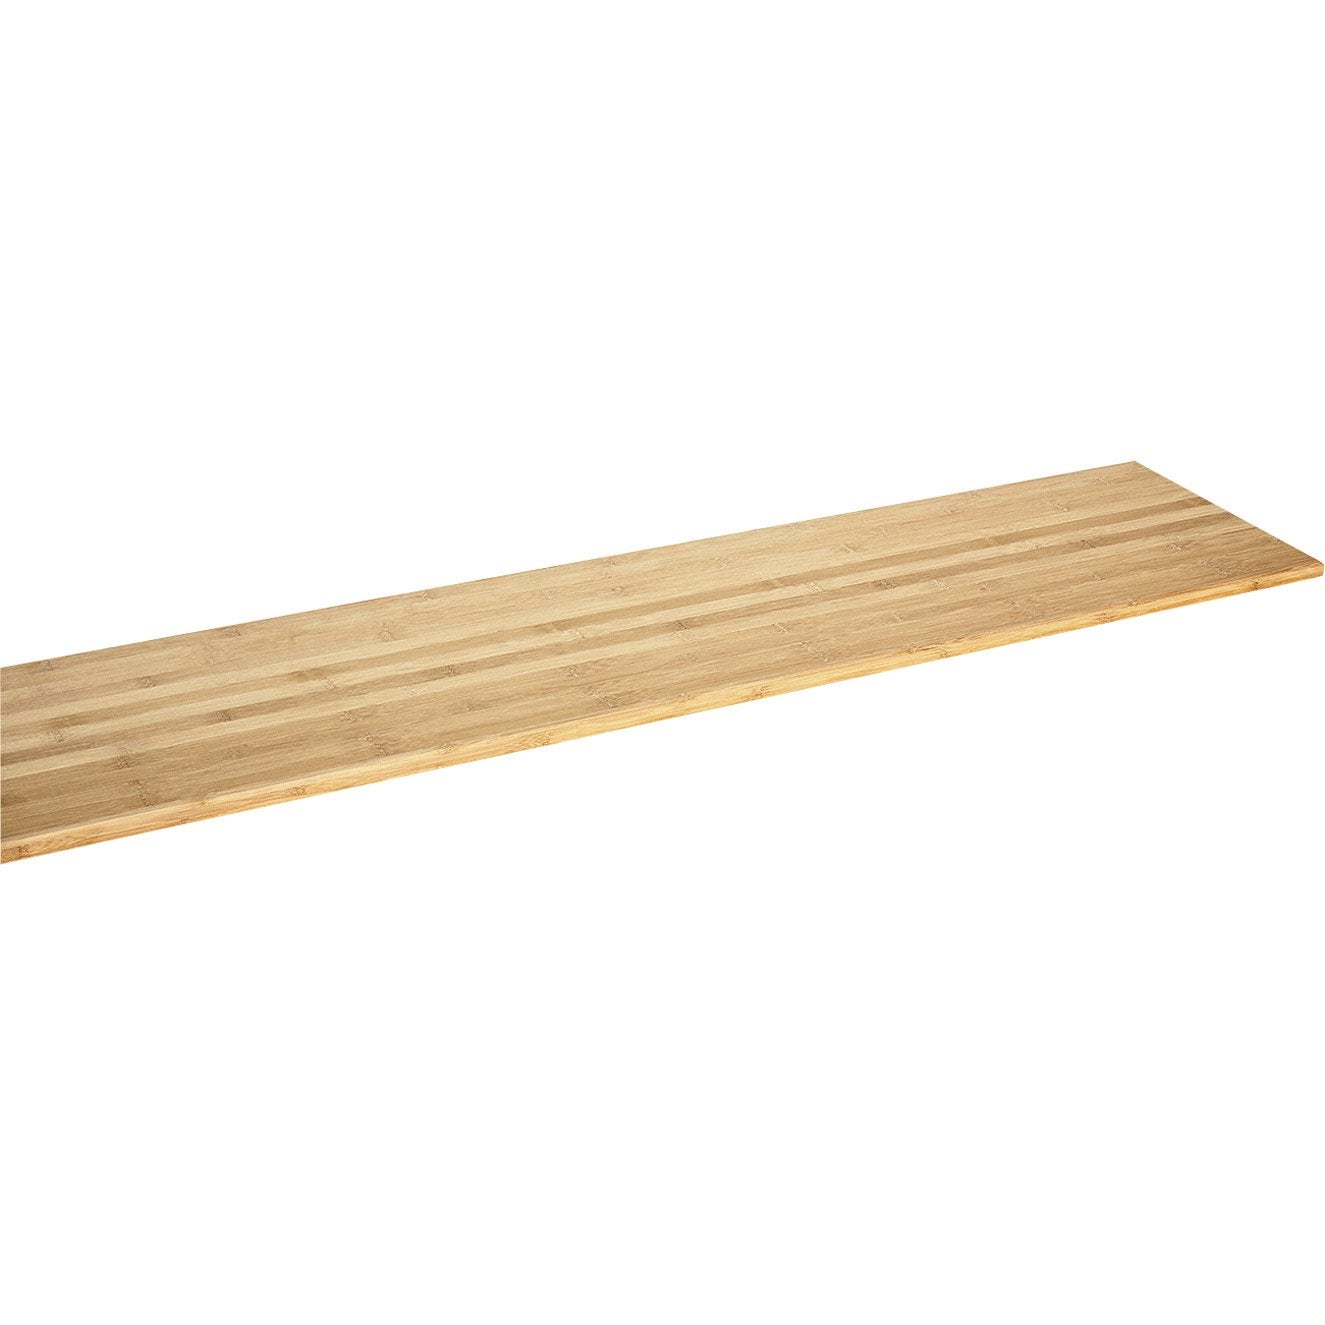 Plan de travail bambou leroy merlin plan de travail sur mesure leroy merlin plan de travail - Lamelle colle leroy merlin ...